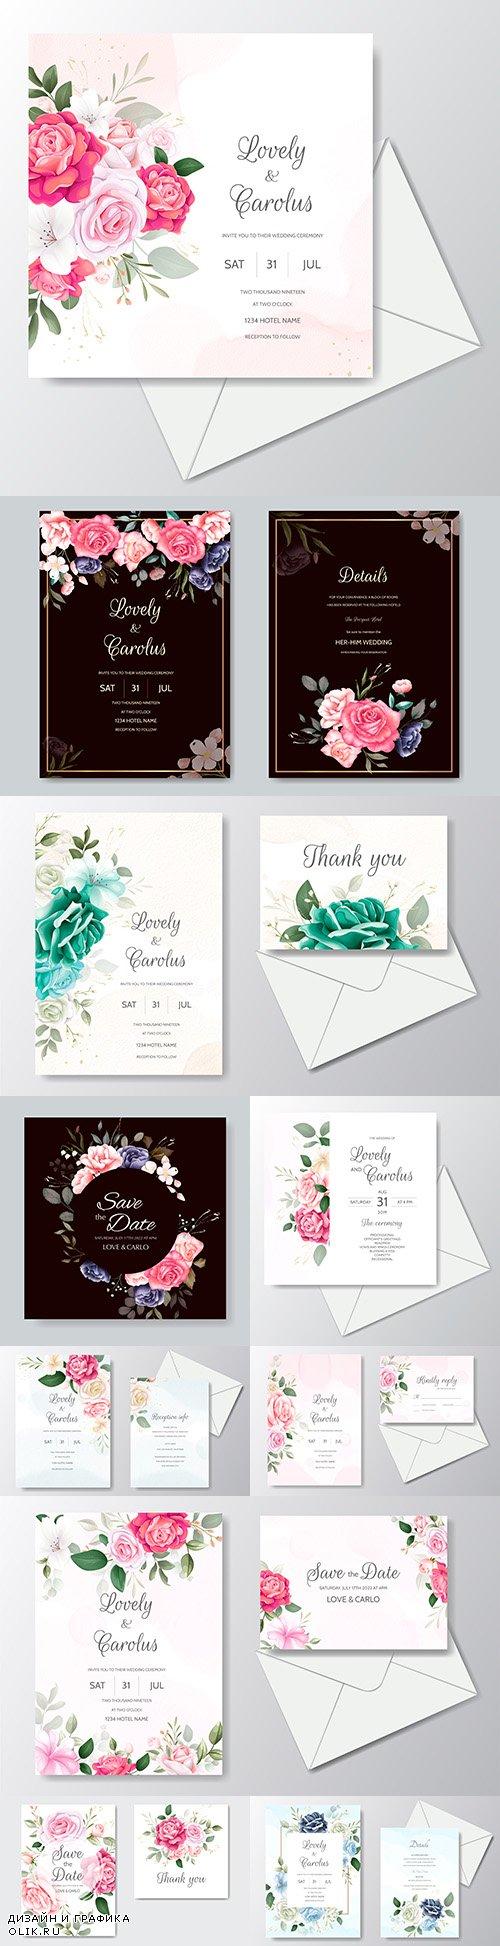 Wedding floral watercolor decorative invitations 20